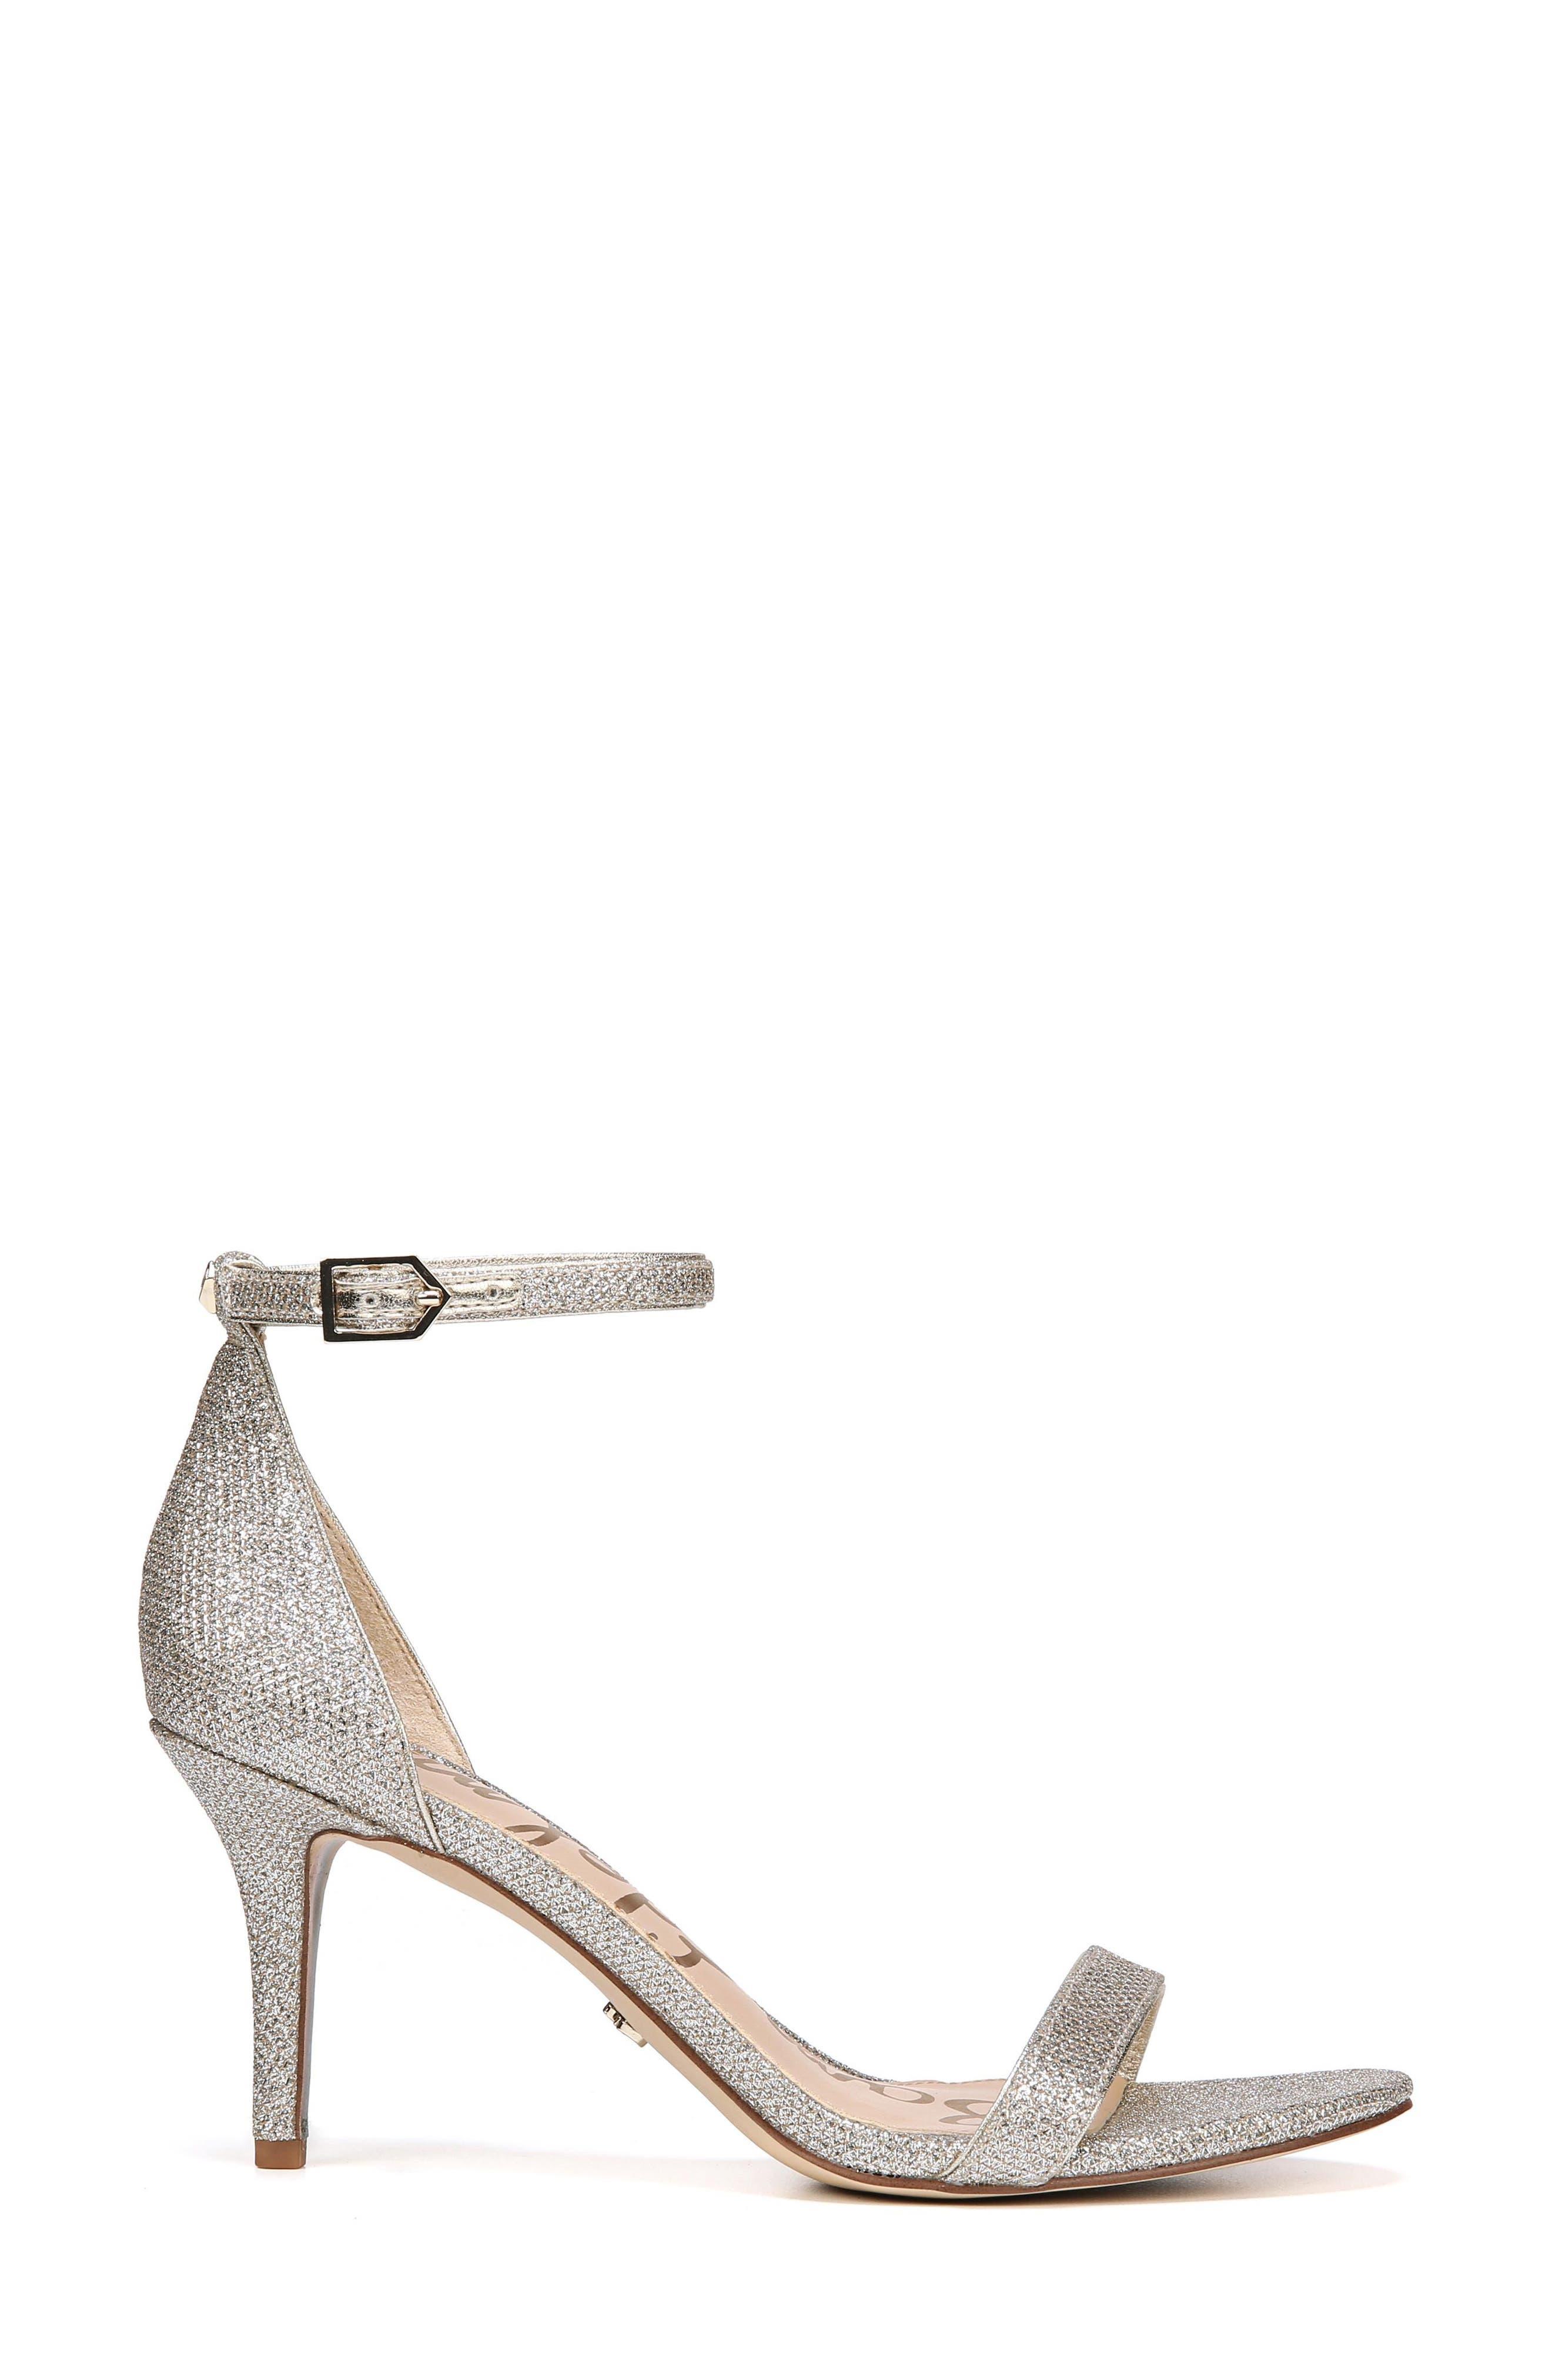 SAM EDELMAN,                             'Patti' Ankle Strap Sandal,                             Alternate thumbnail 3, color,                             JUTE FABRIC